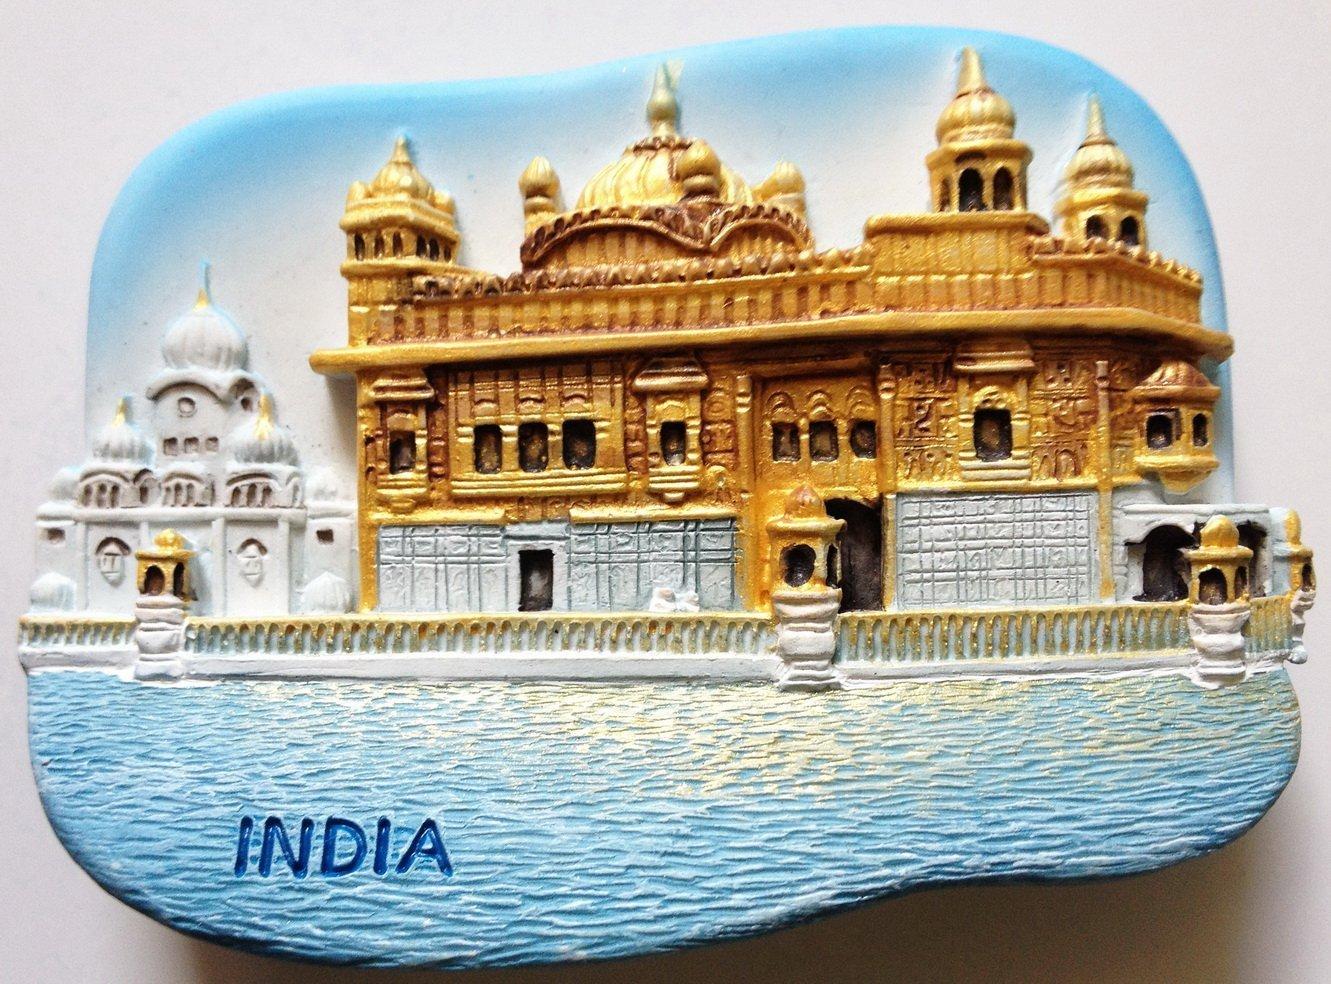 The Golden Temple (Harmandir Sahib) Amritsar INDIA 3D fridge magnet